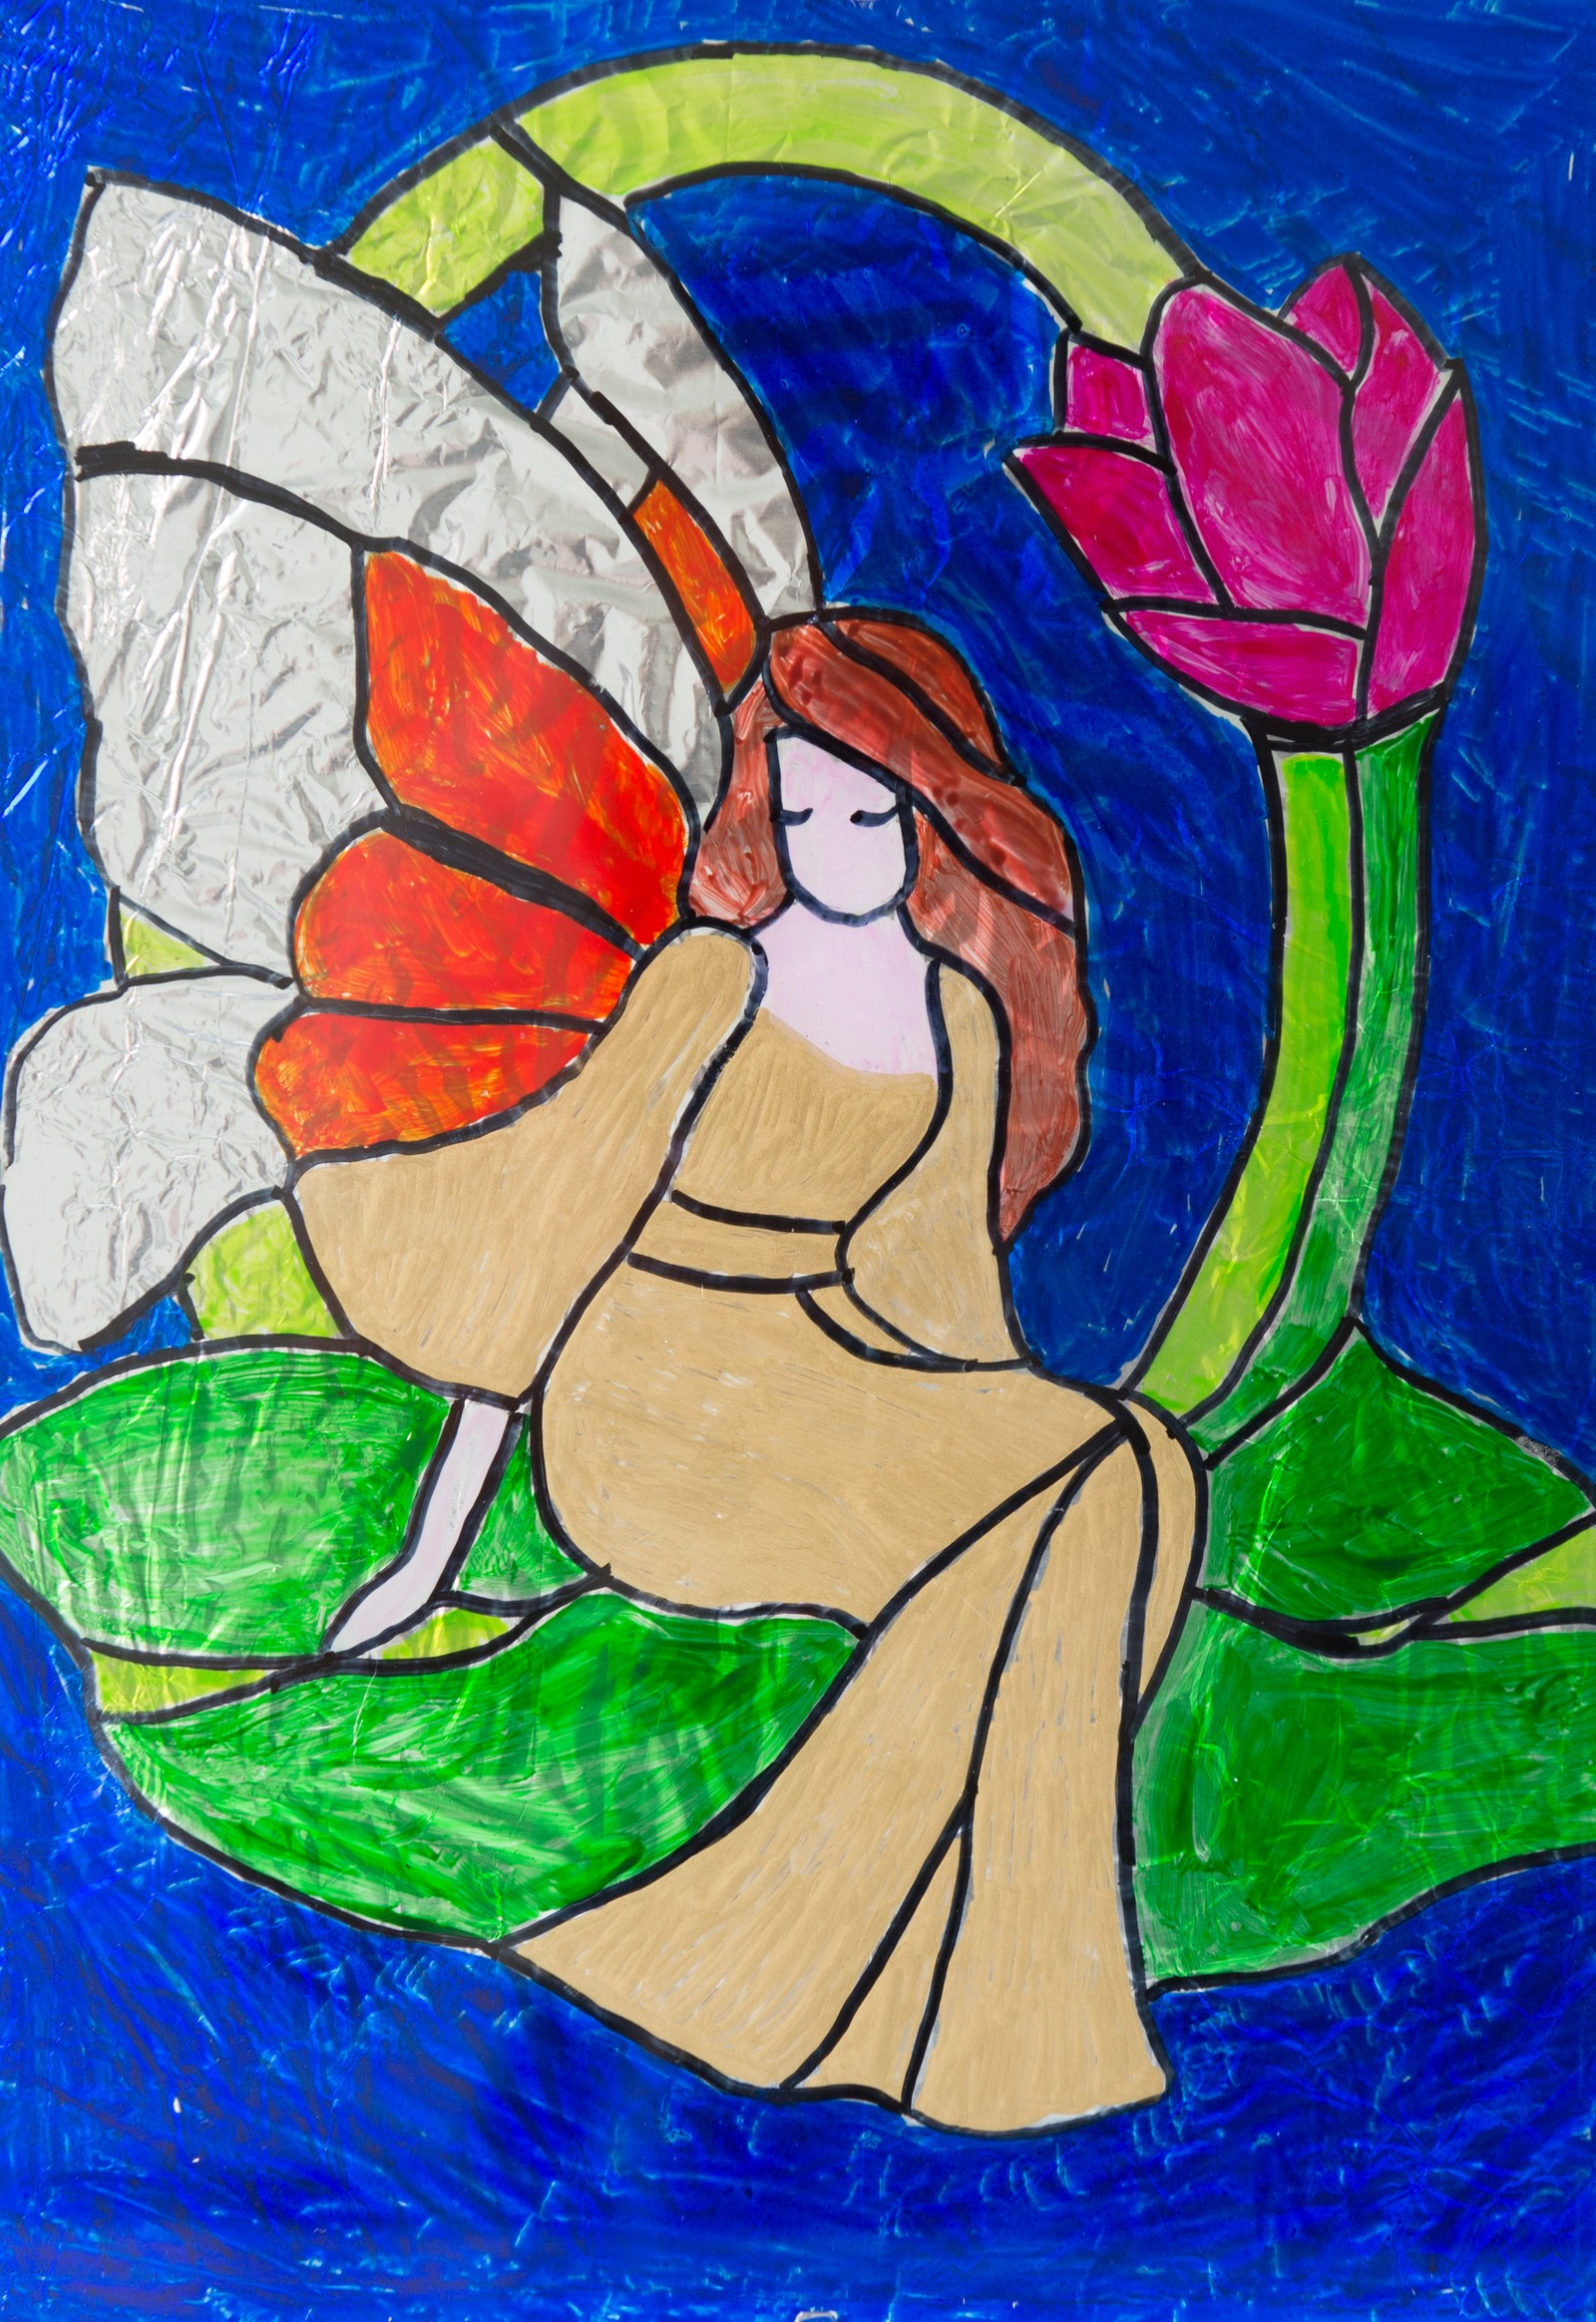 Jente i gullkjole - Natthida Noijan, Flora